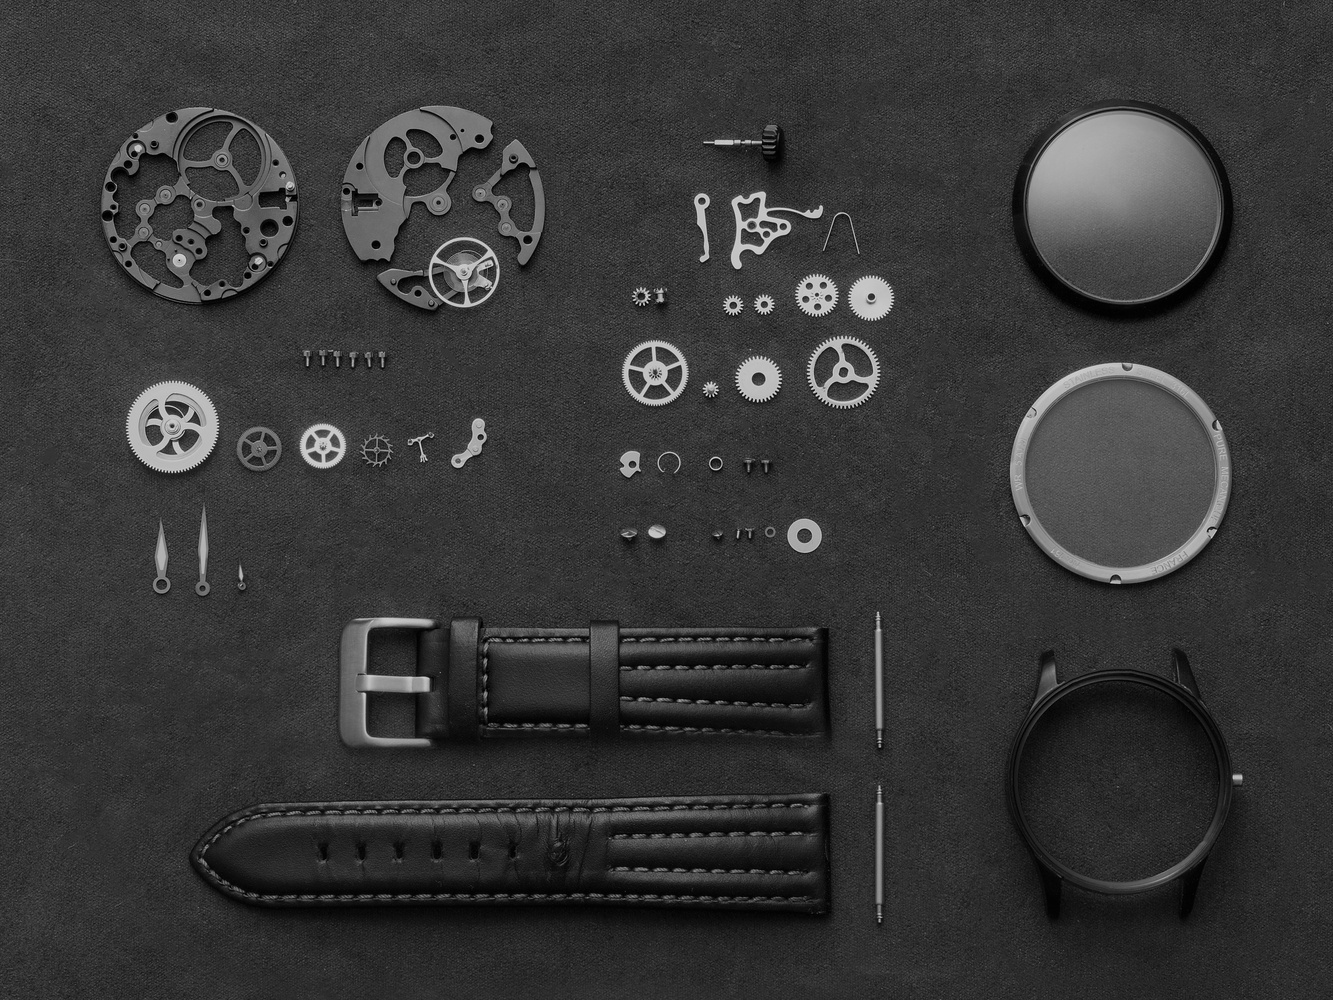 Watch_deconstructed by Philip De Smedt